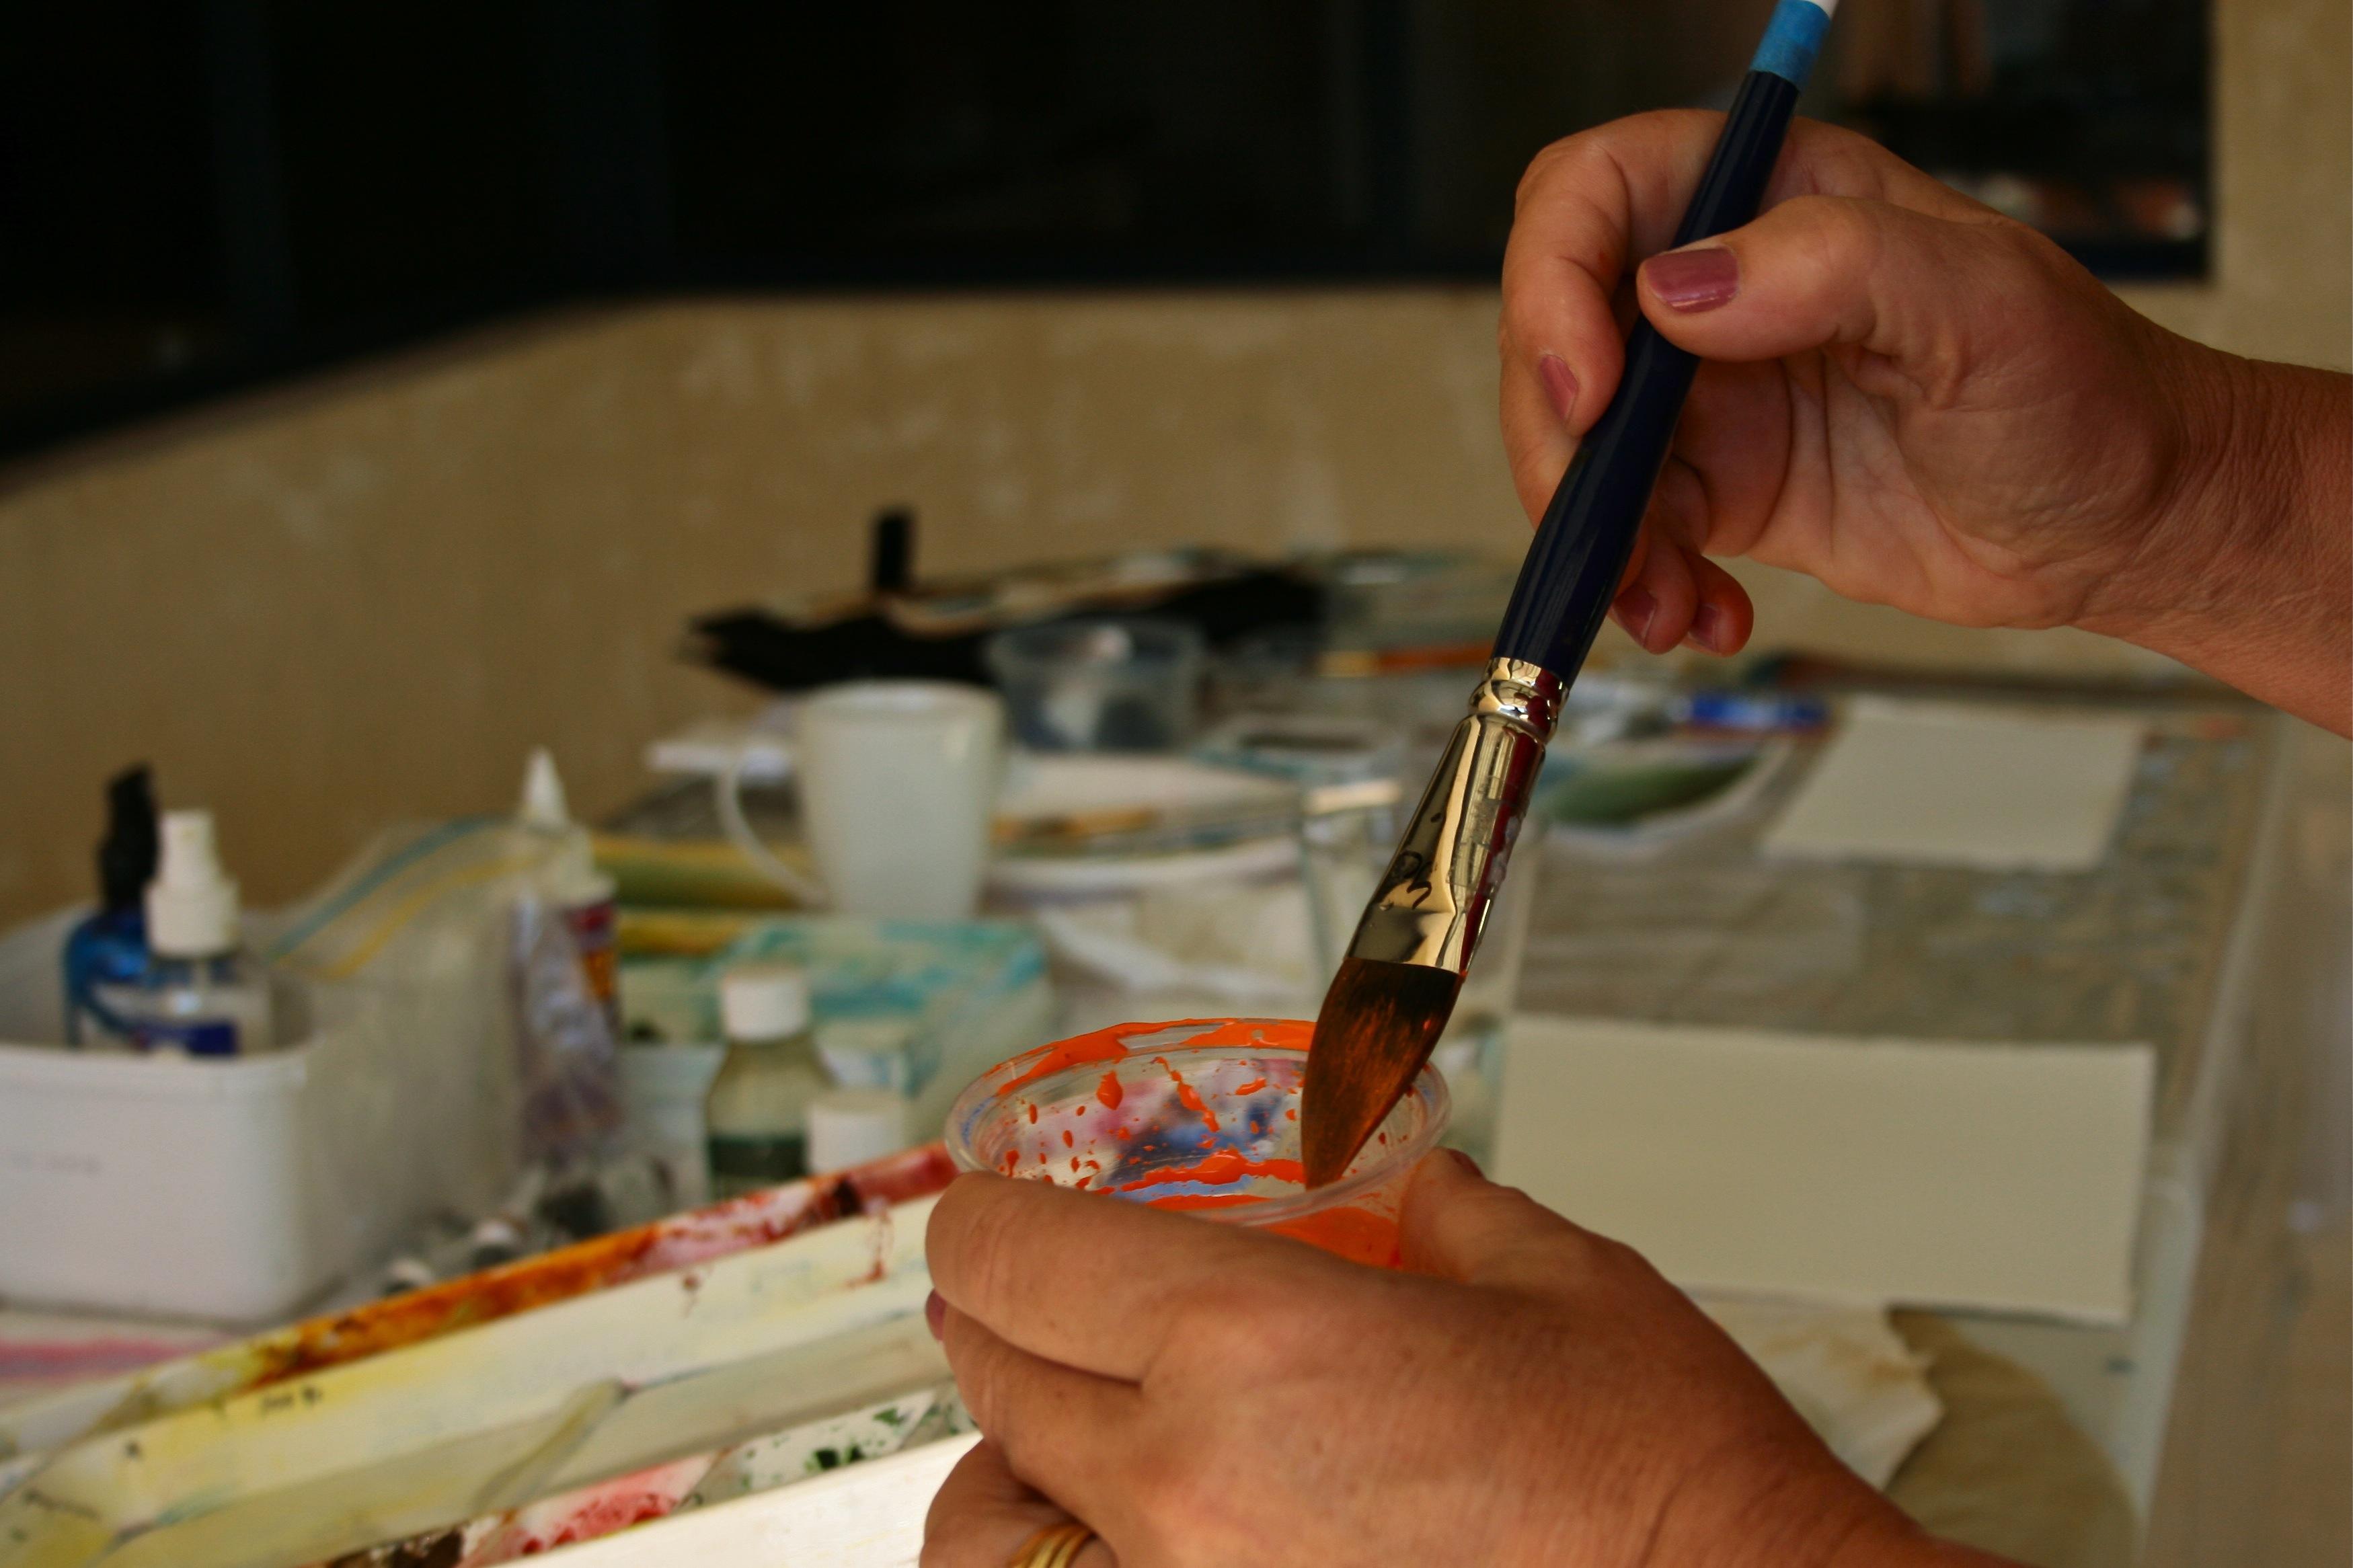 mixing the paint debiriley.com